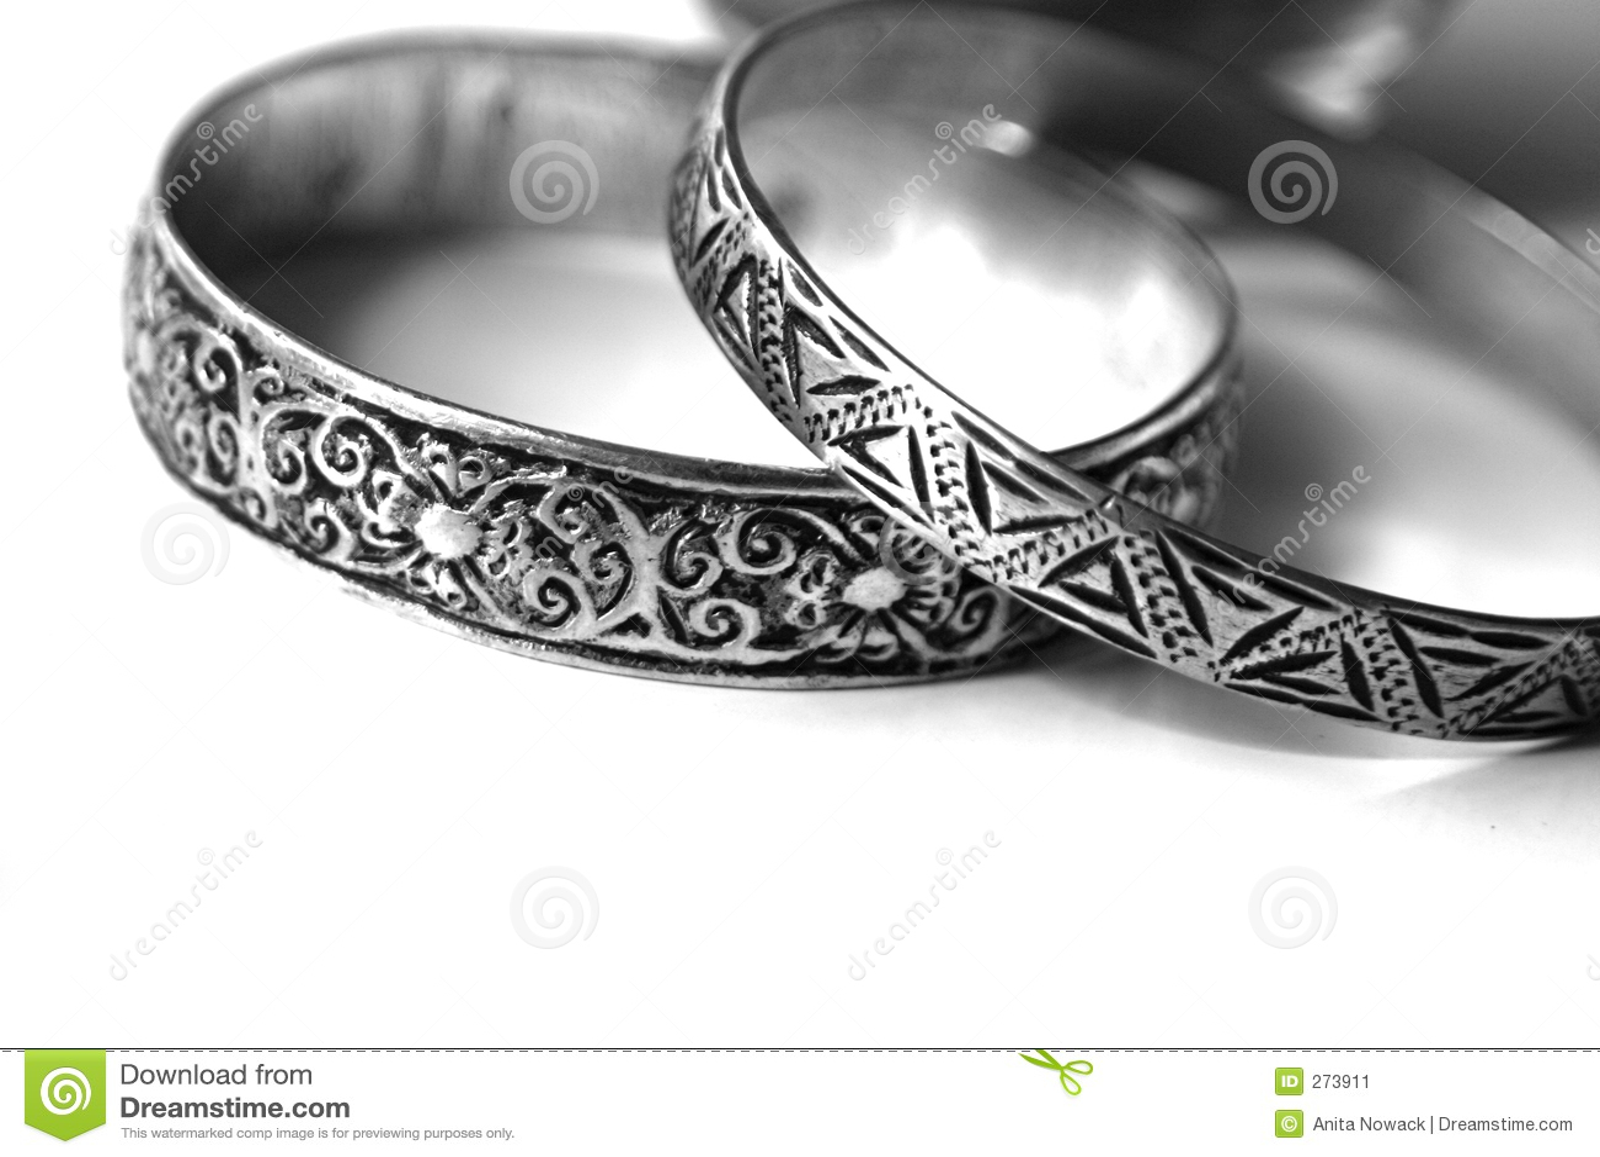 Ethnic Silver Bracelets